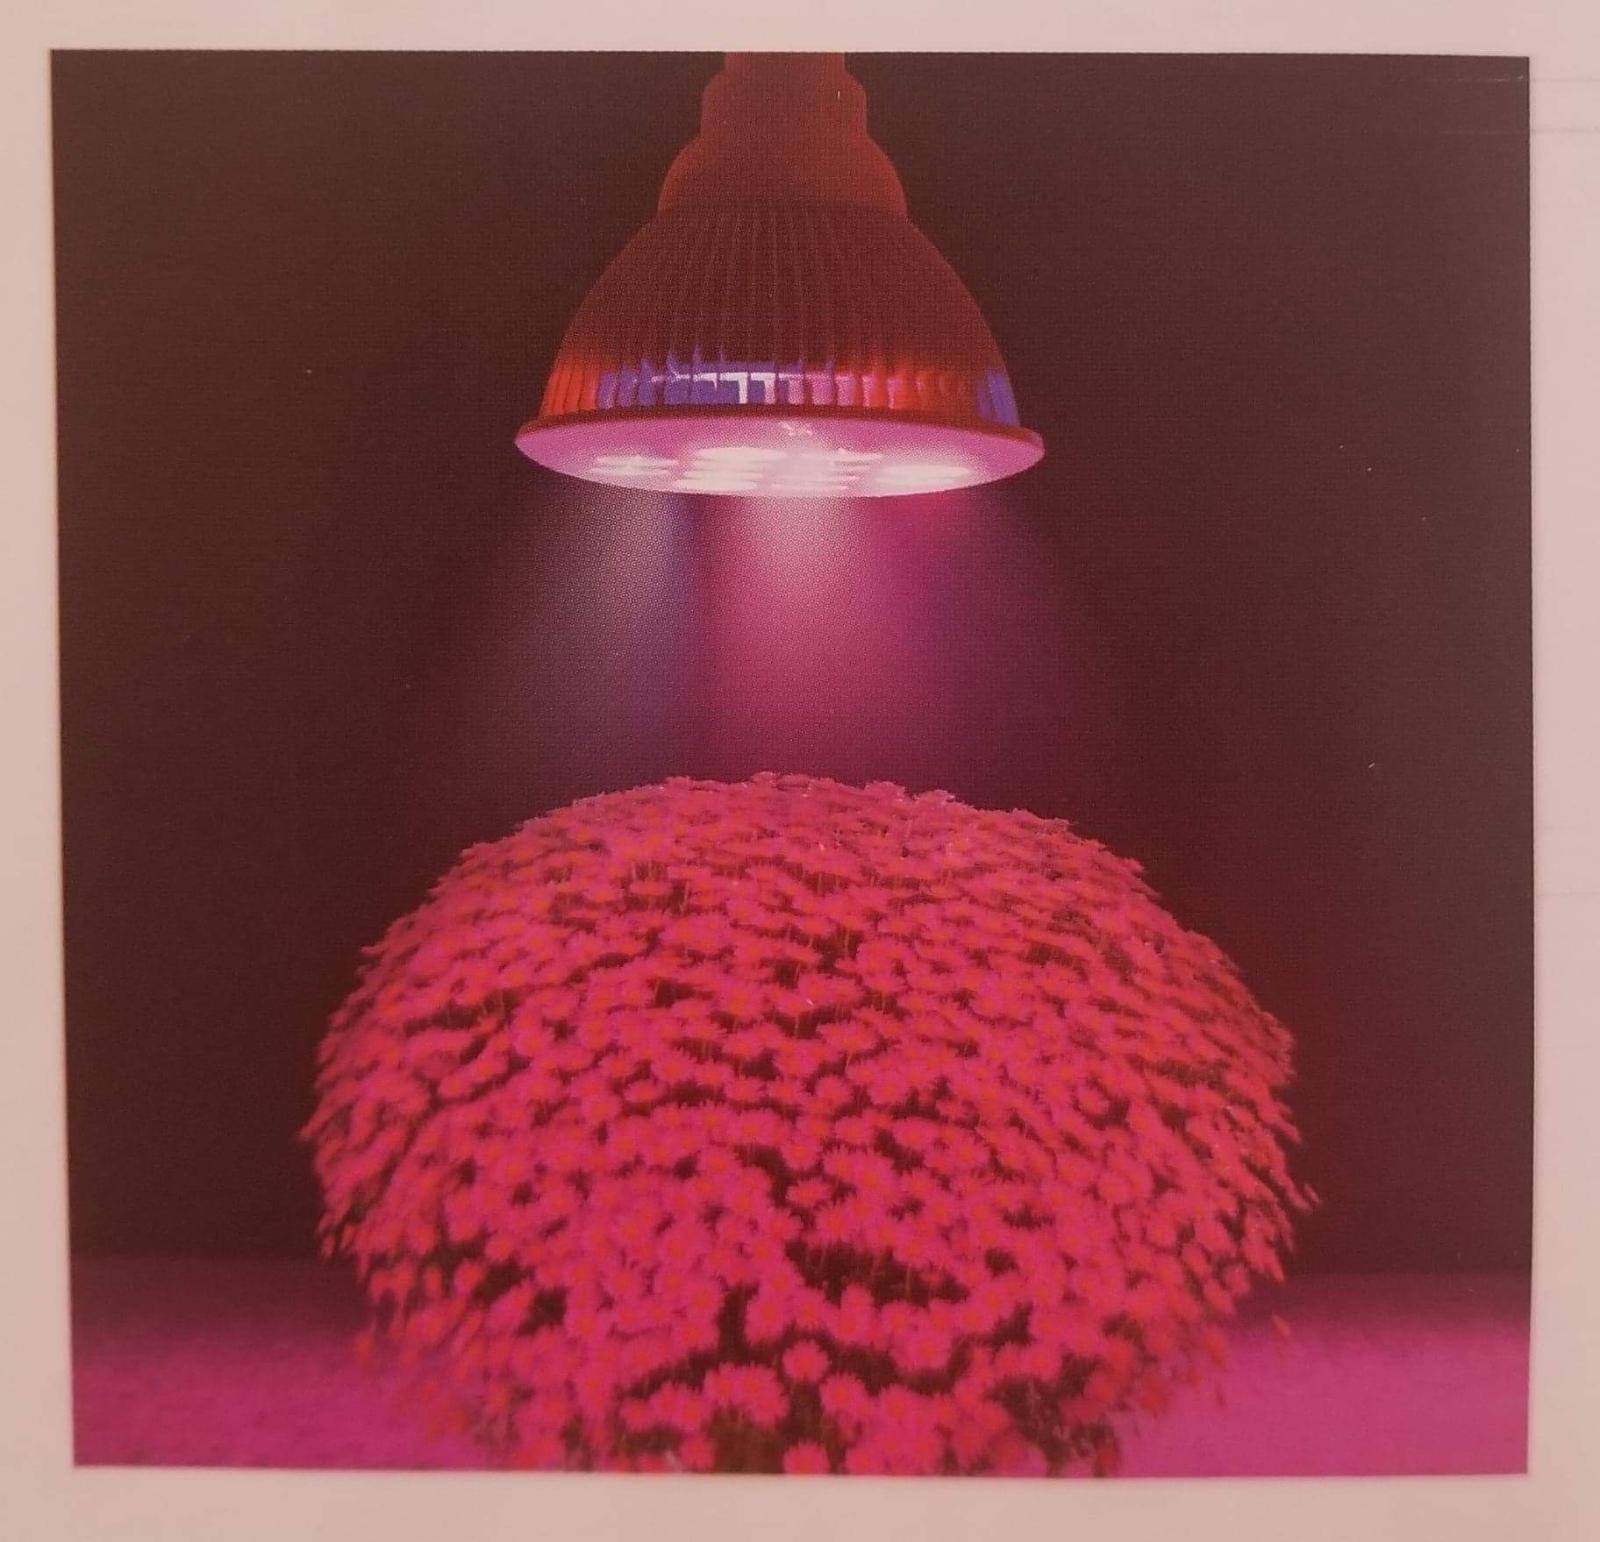 TaoTronics LED Plant Grow Red & Blue Light 12w